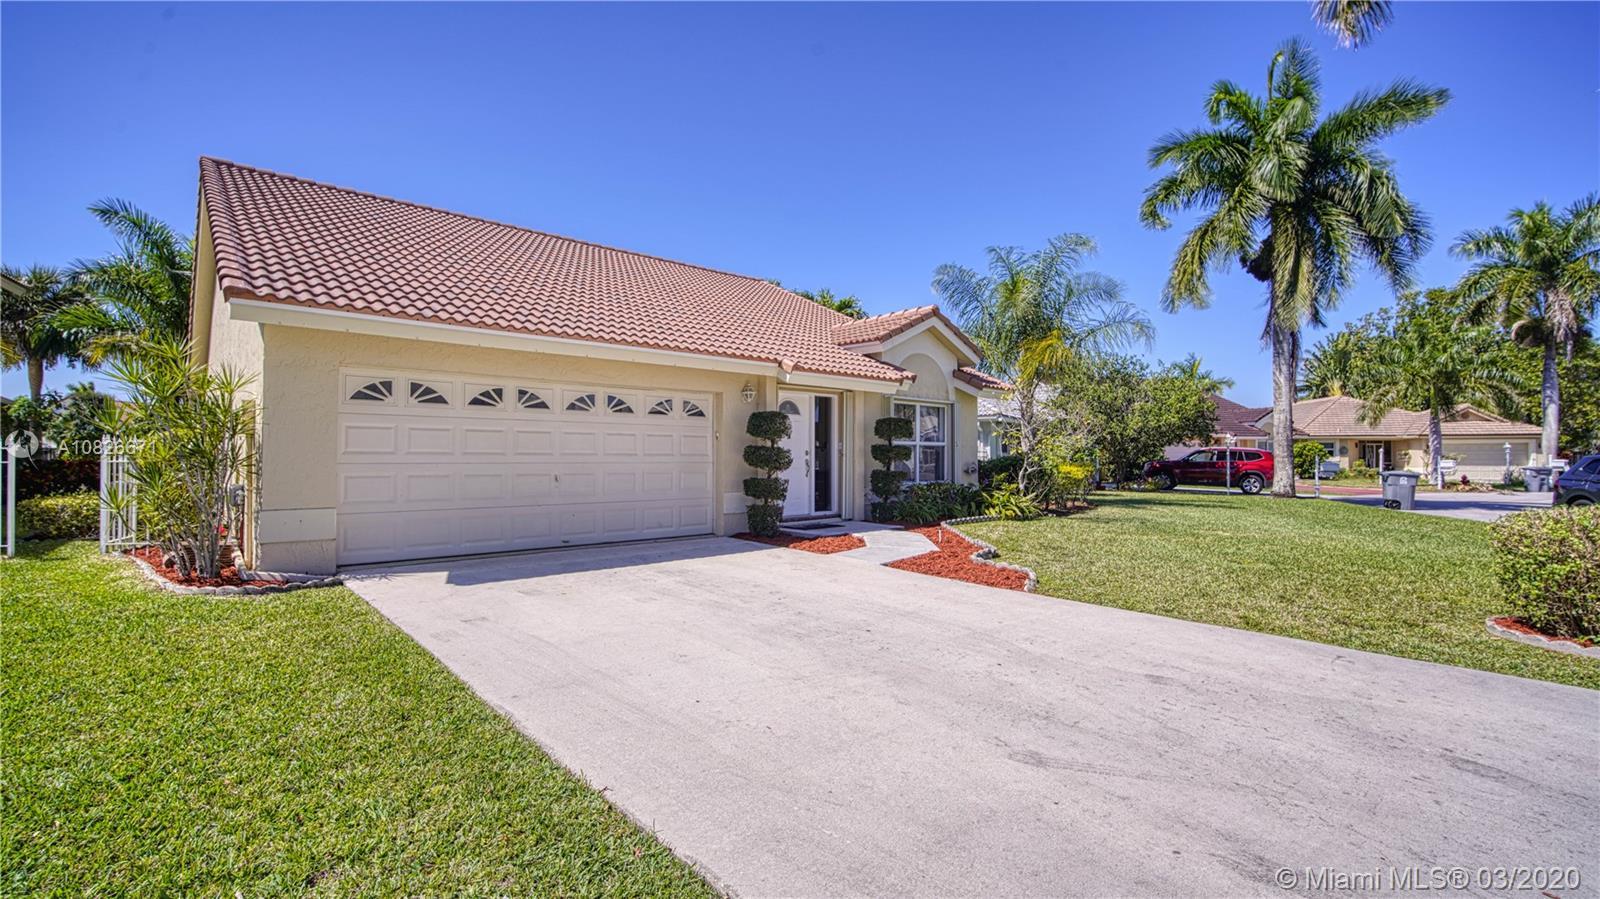 21301 Millbrook Ct, Boca Raton, FL 33498